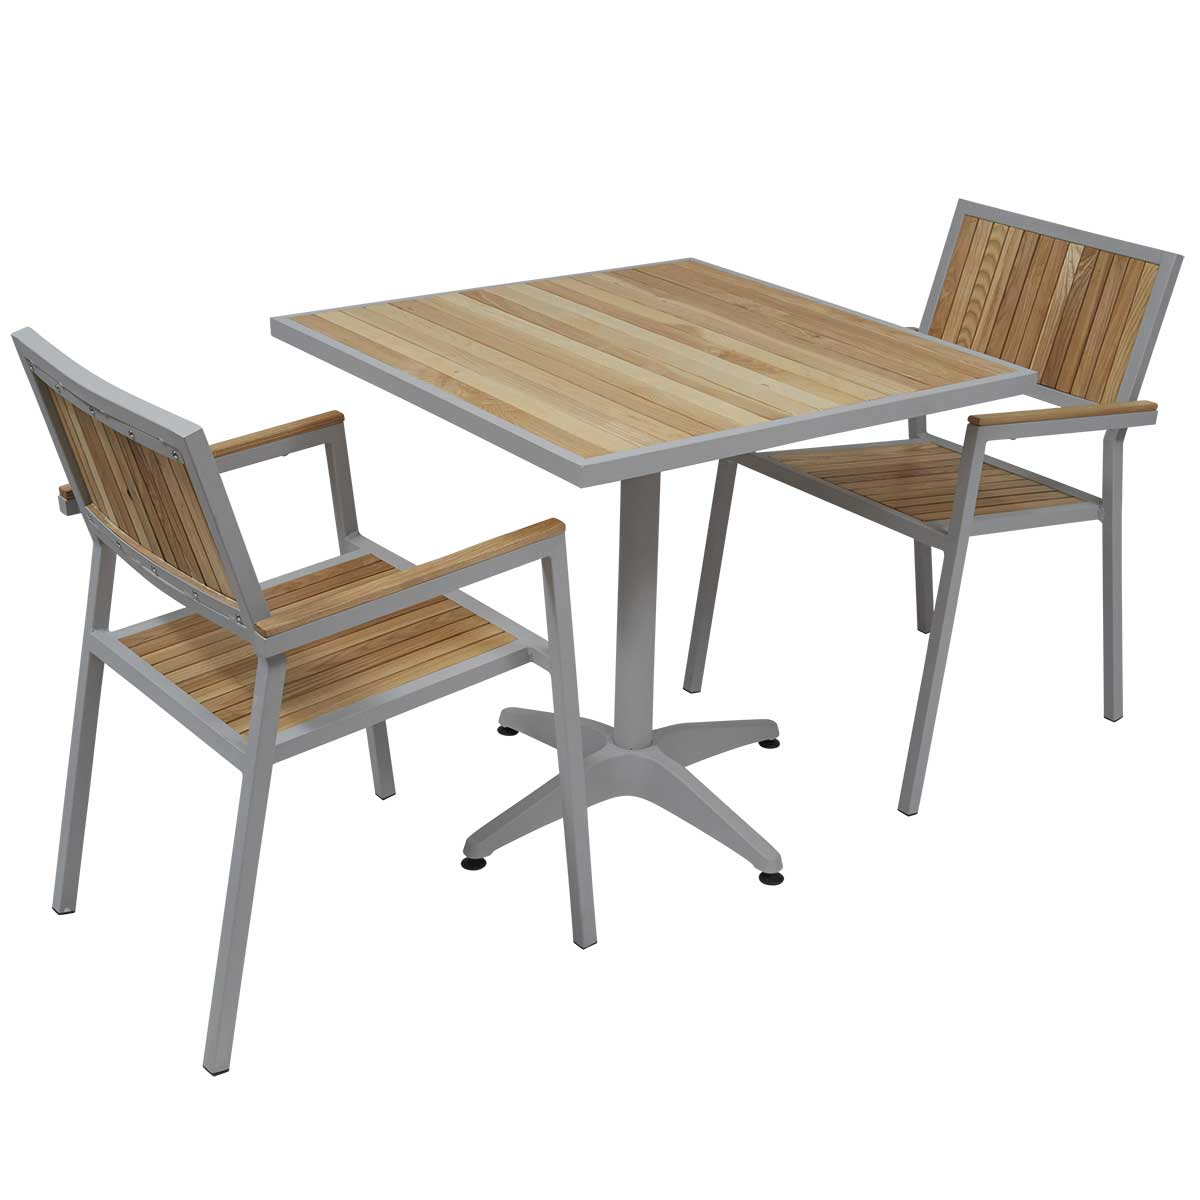 Solde Table Jardin Frais Table Terrasse Pas Cher Of 20 Génial solde Table Jardin